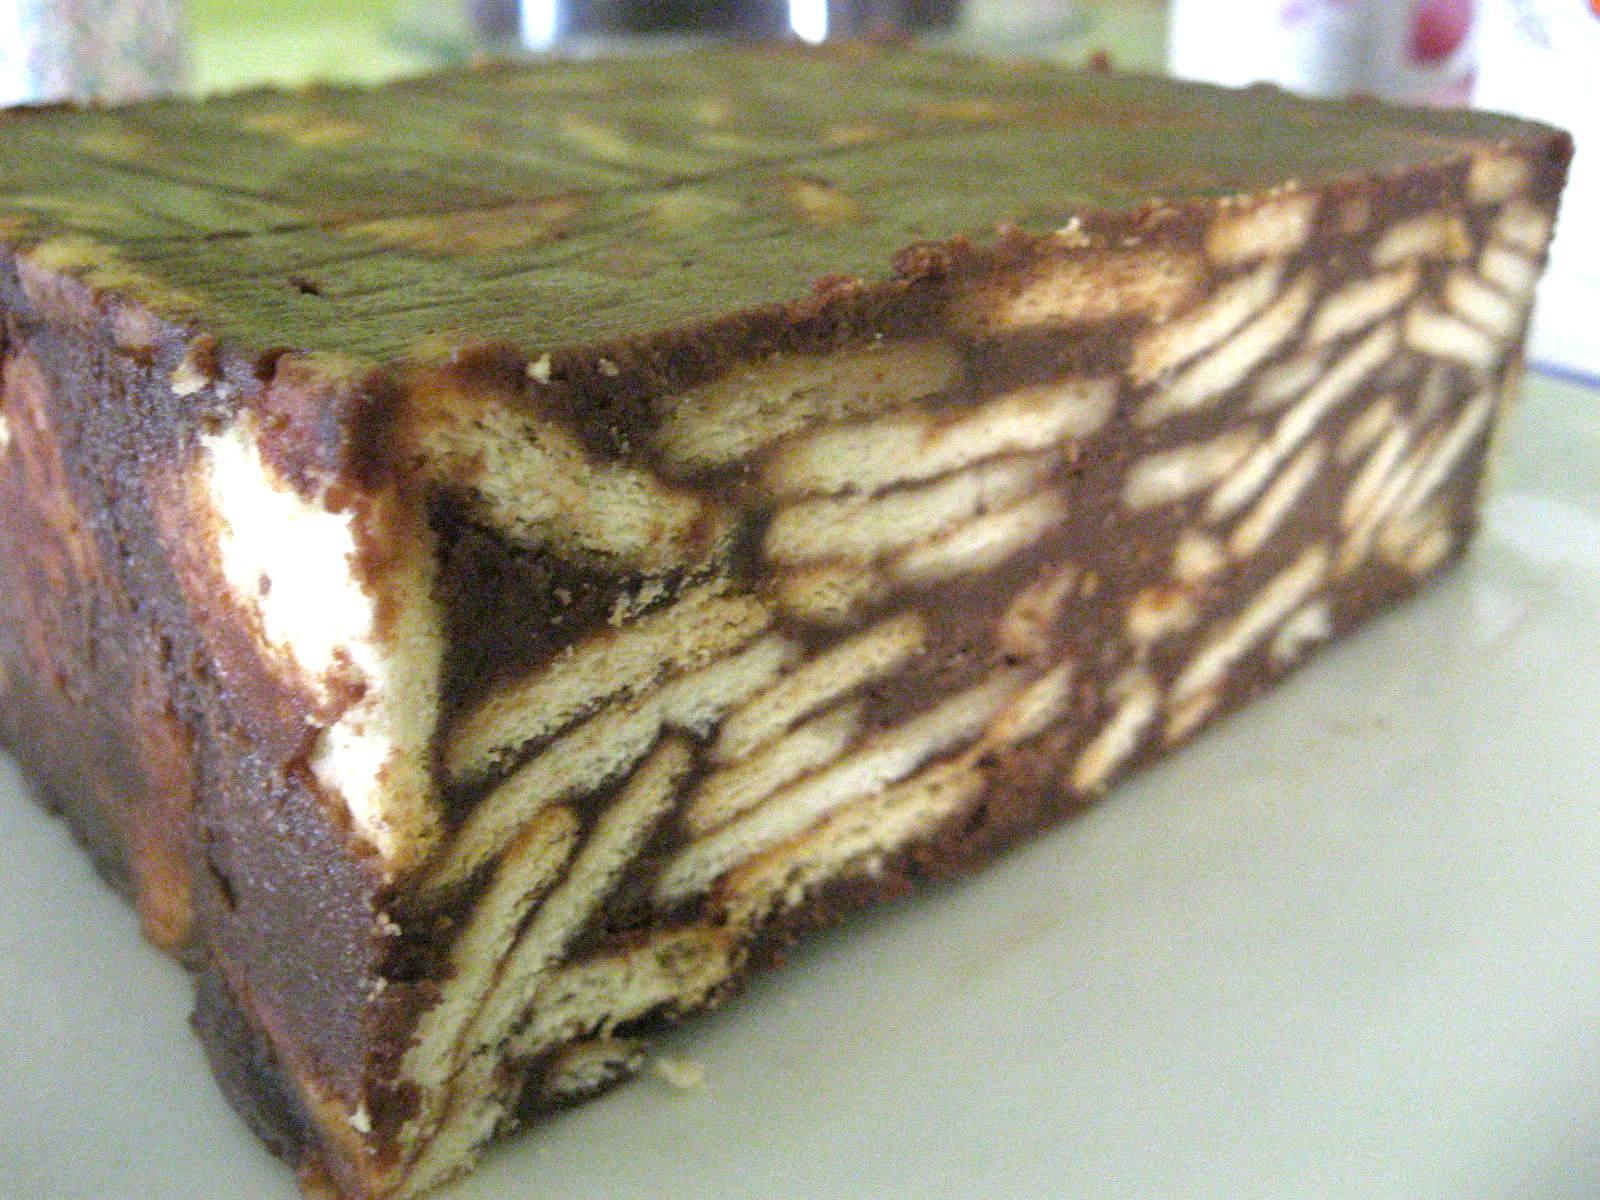 Resepi Kek Batik Biskut Merry http://sentuhankutatapanmu.blogspot.com